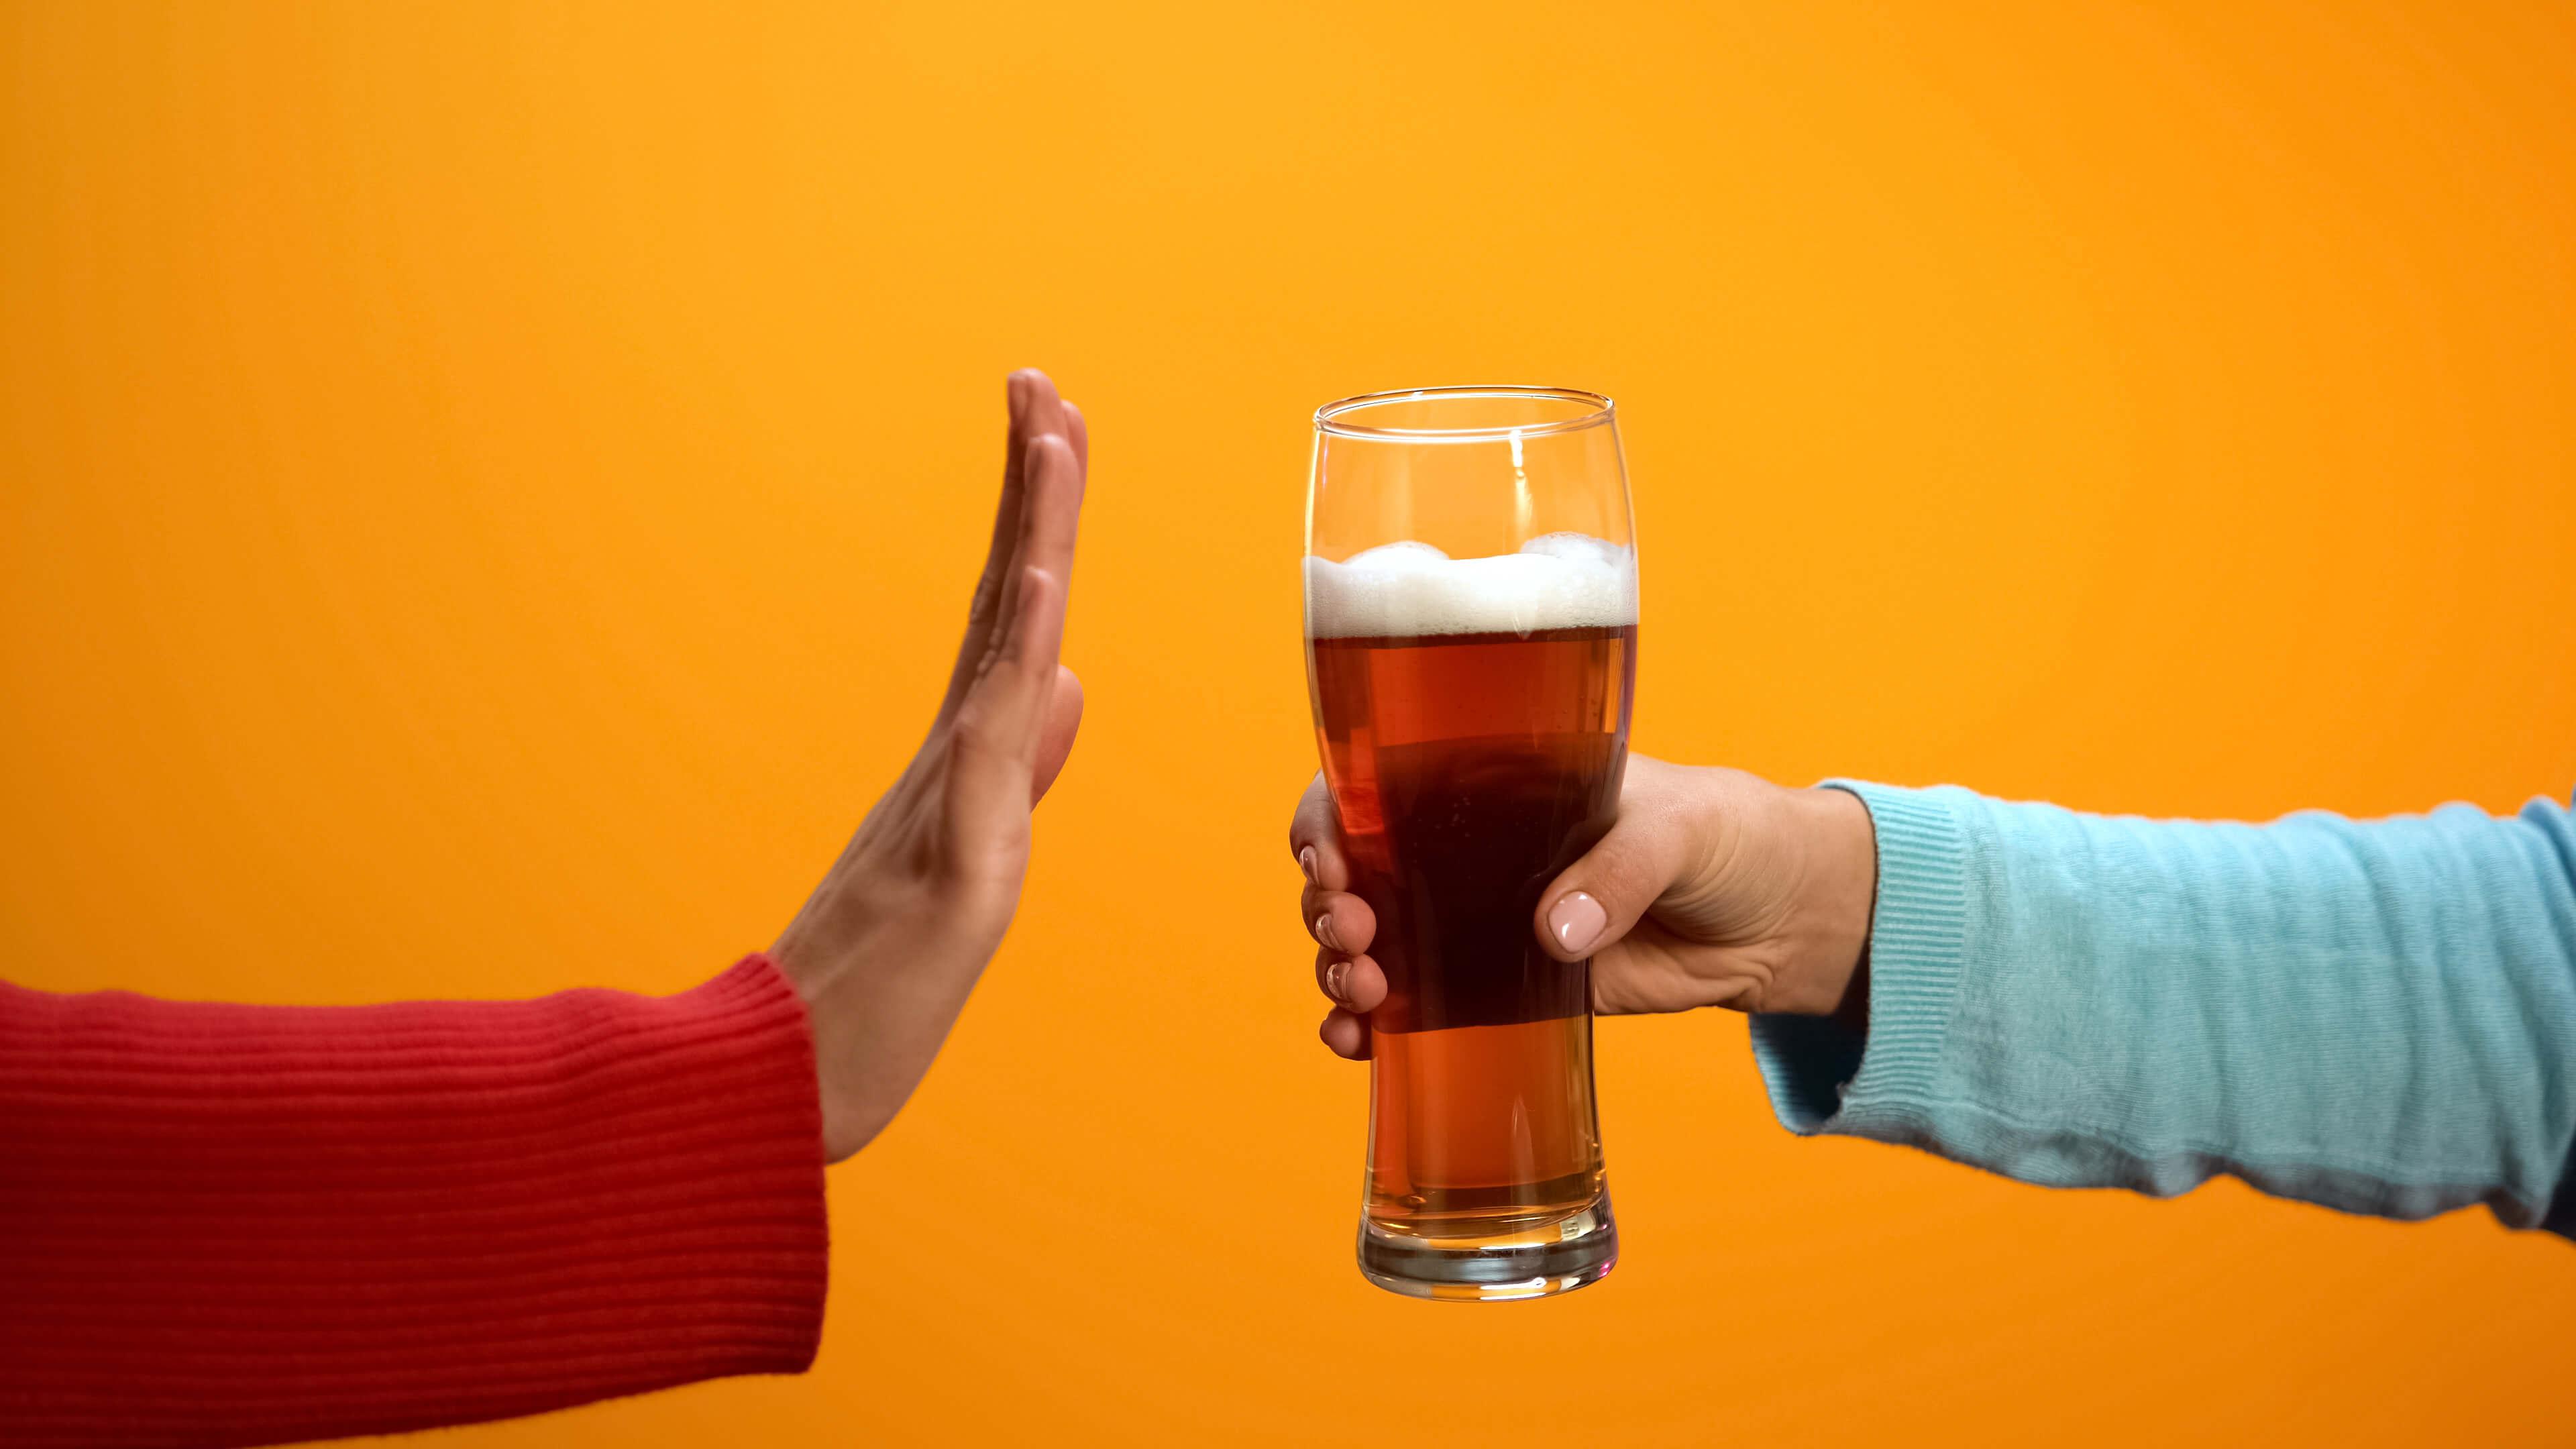 Abandonner l'alcool